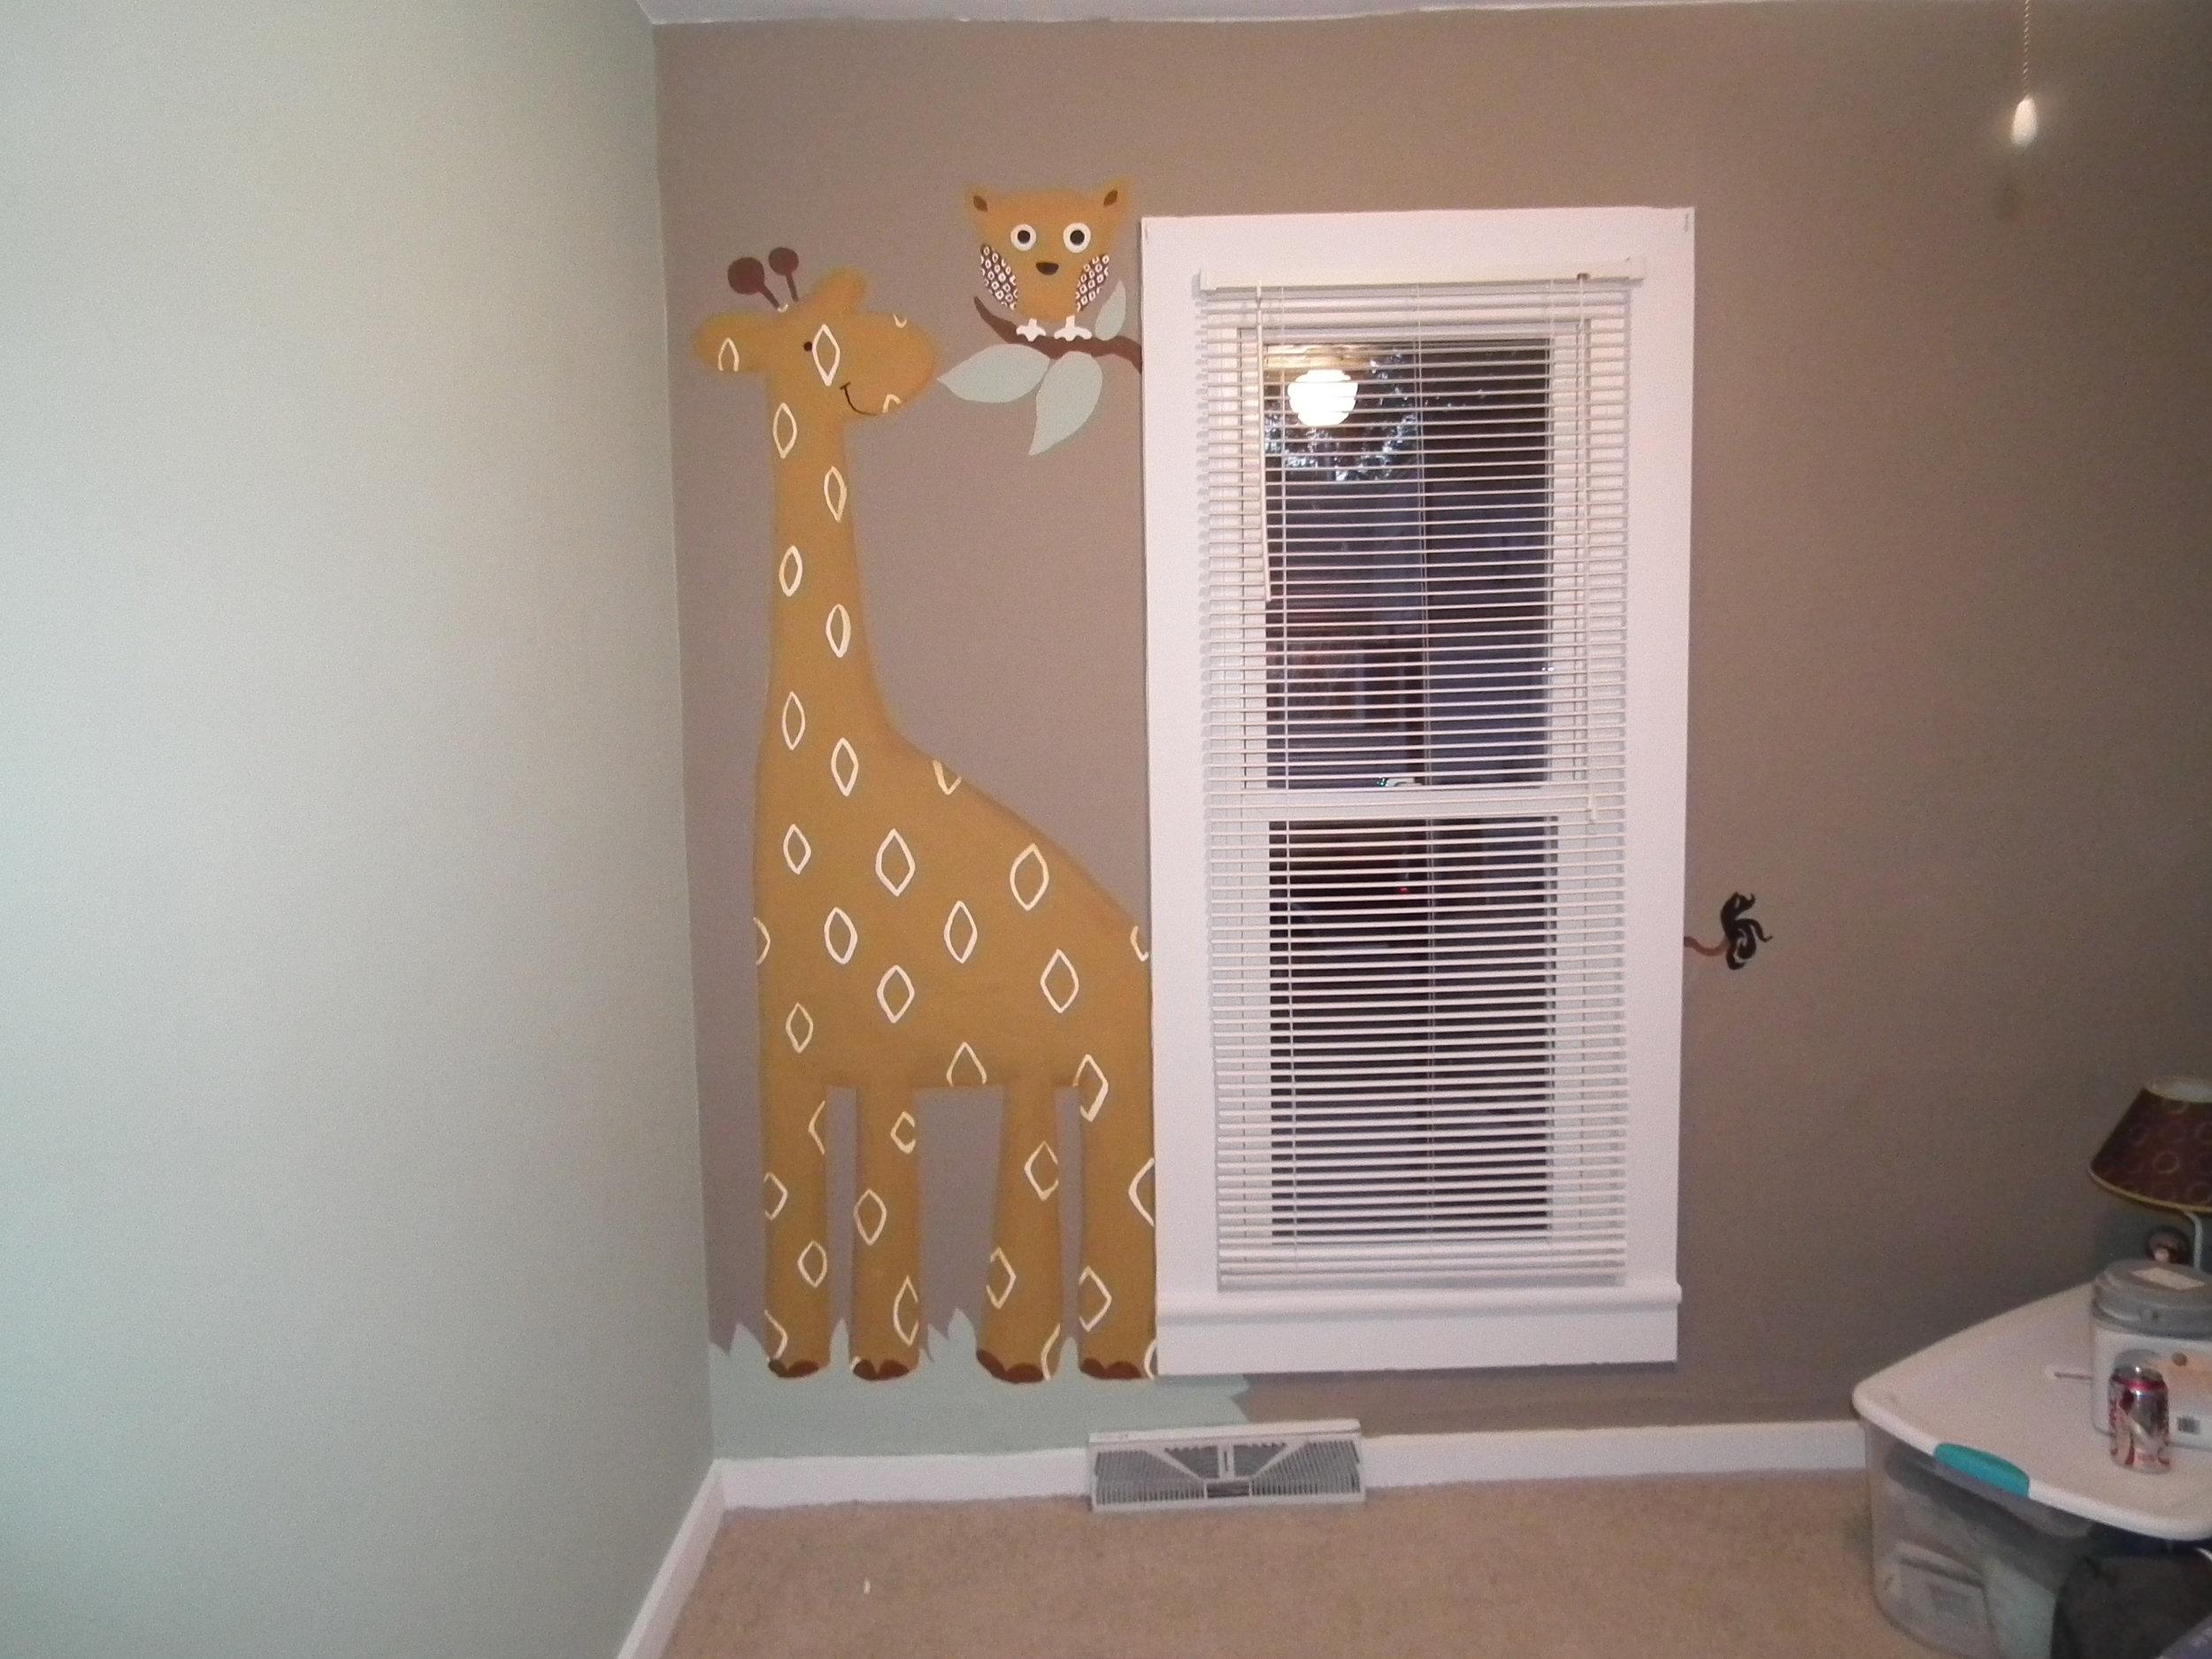 giraffe mural.JPG